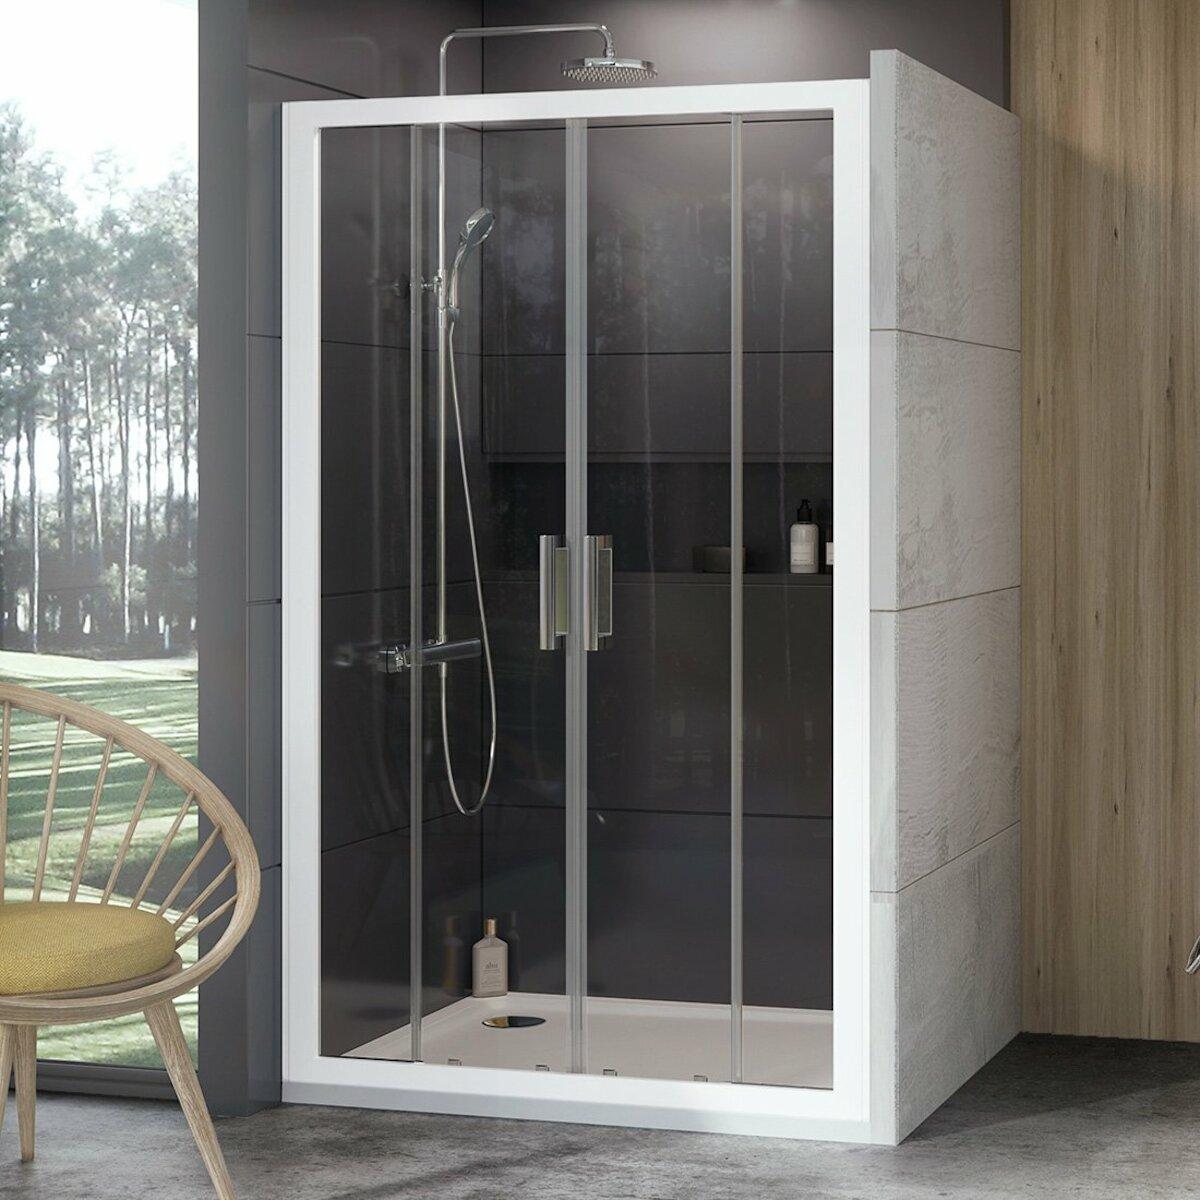 Sprchové dvere 110x190 cm Ravak 10° biela 0ZKL0100Z1